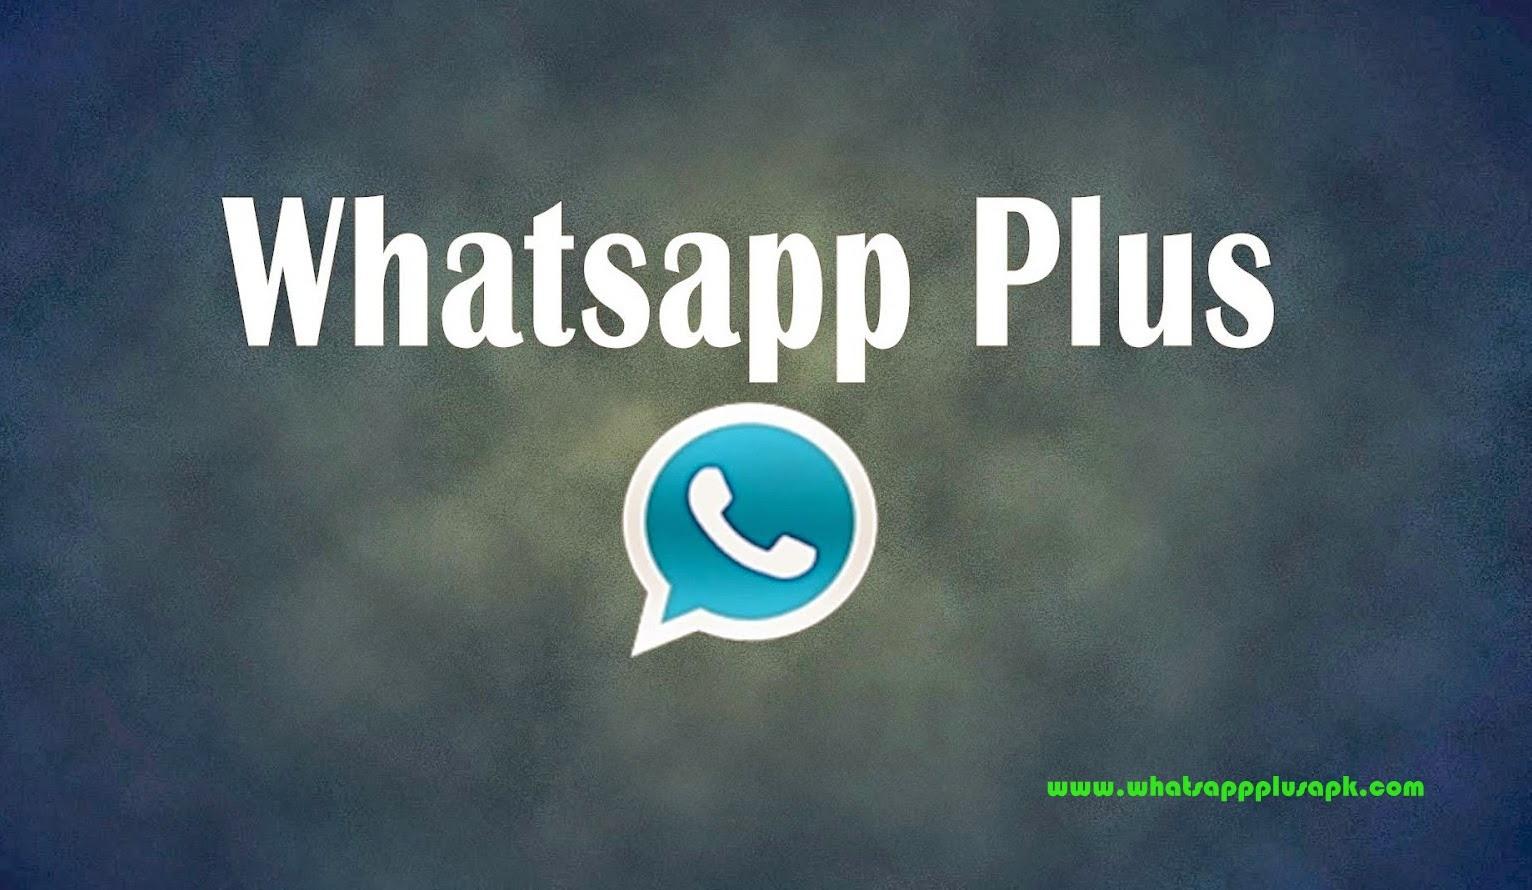 Whatsapp apk download for nokia x2-01